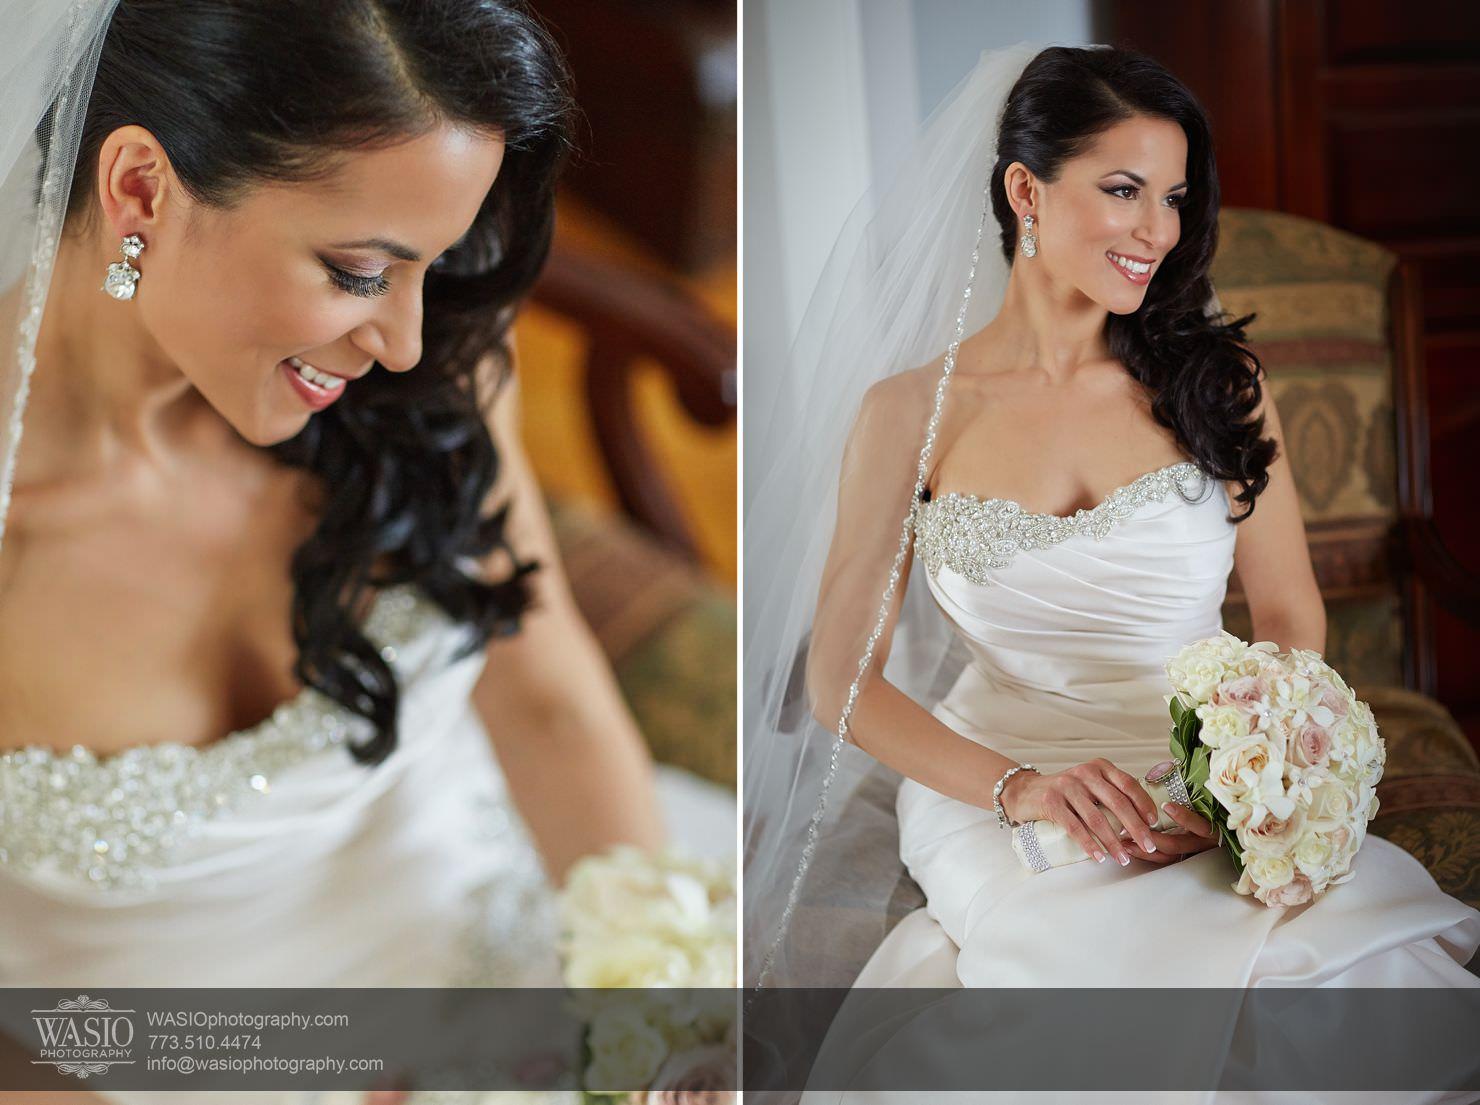 010_Chicago-Spring-Wedding_Chrissy-Andrew_3P4C5401-copy Chicago Spring Wedding - Chrissy + Andrew